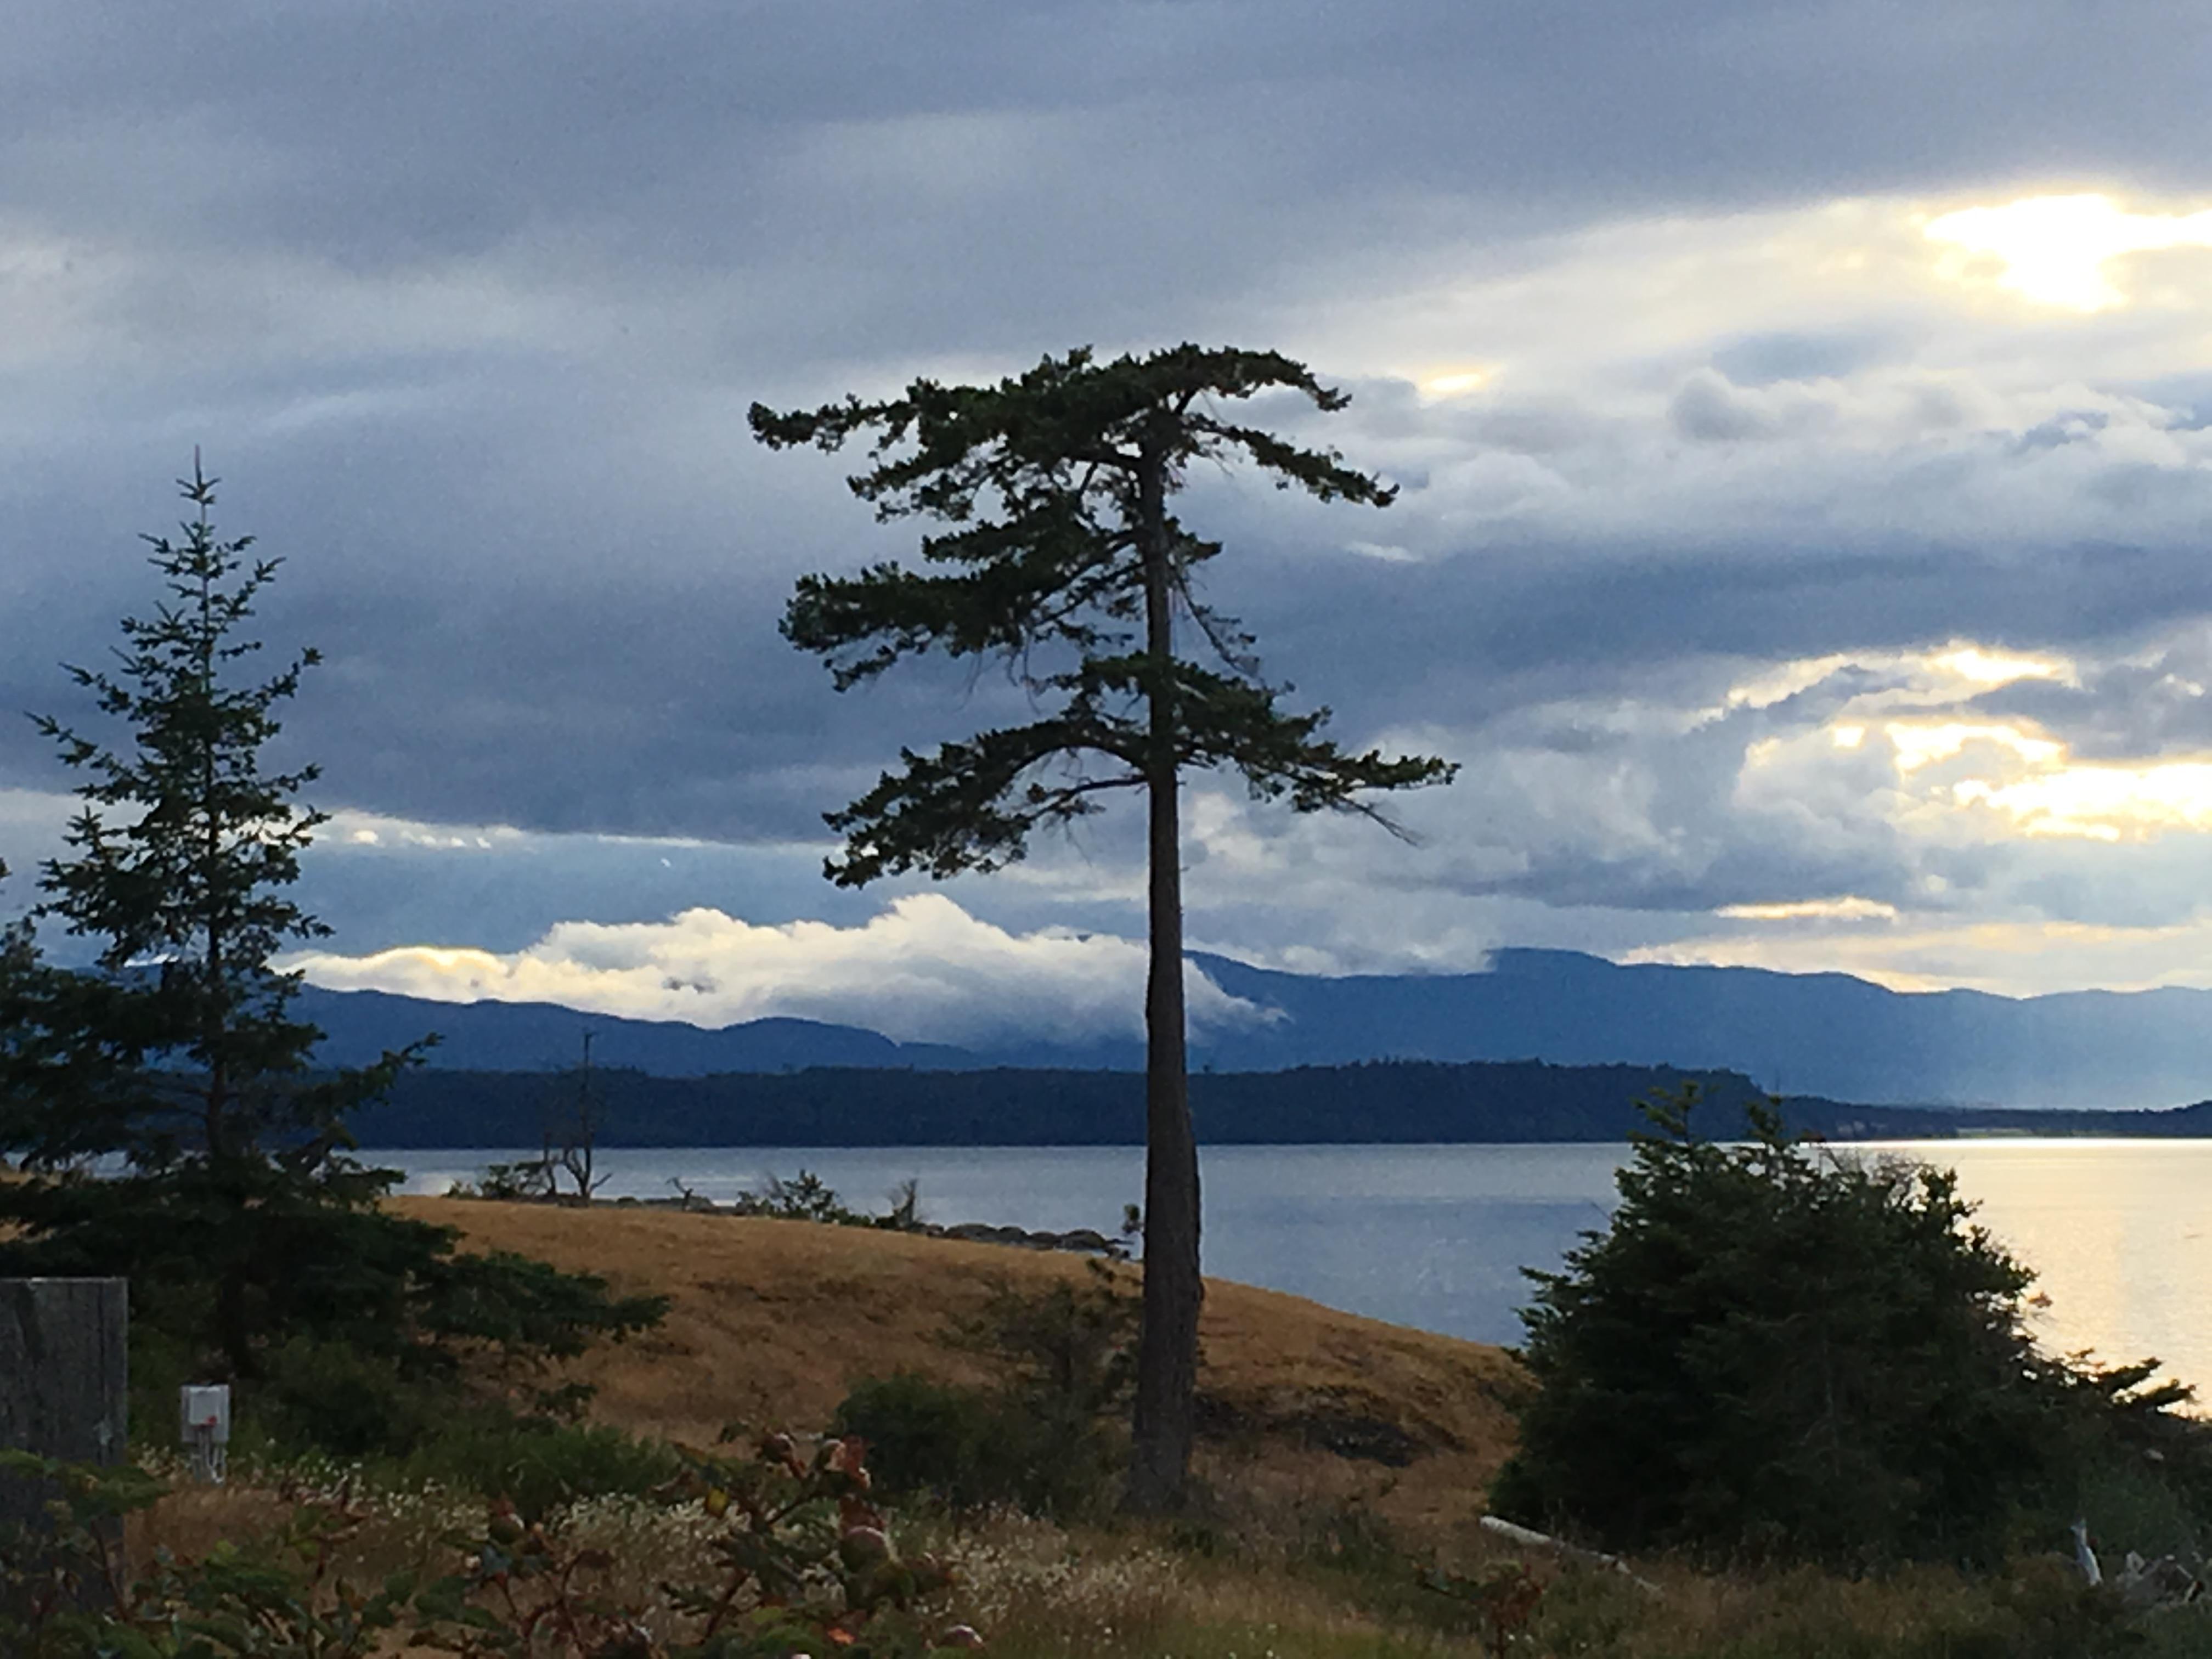 Tree Grassy Point